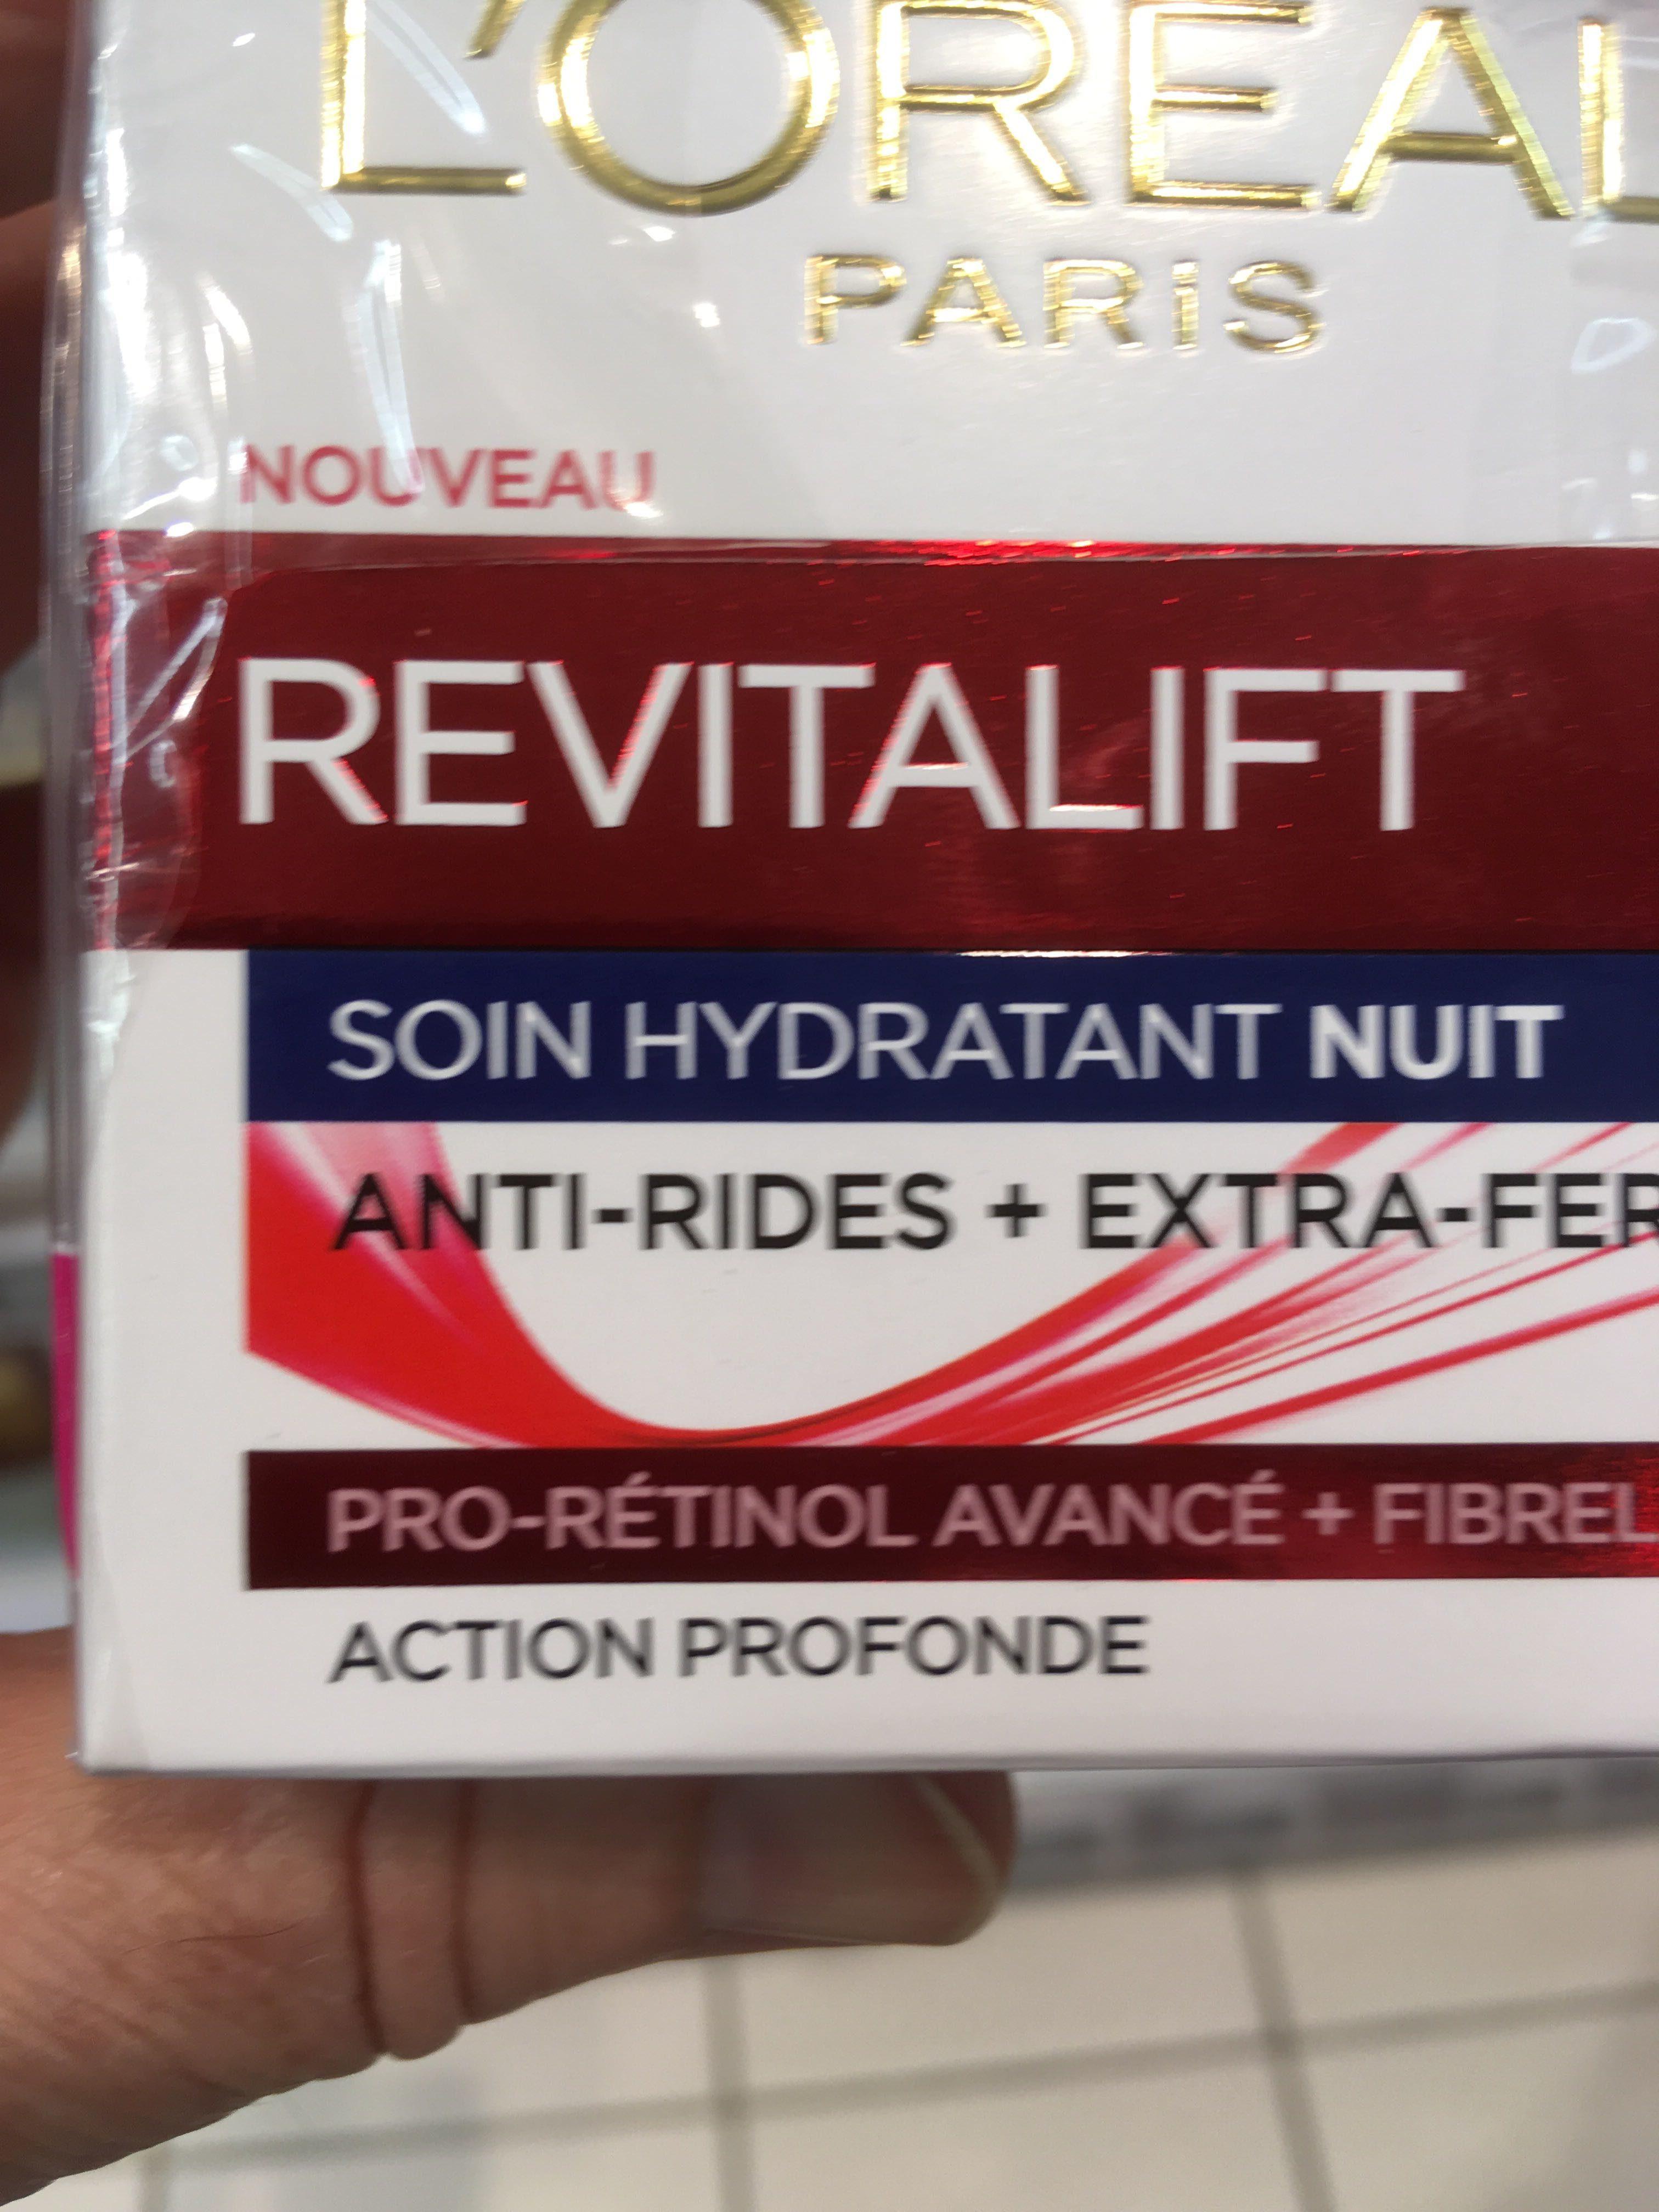 Revitalift Soin hydratant nuit - Product - fr